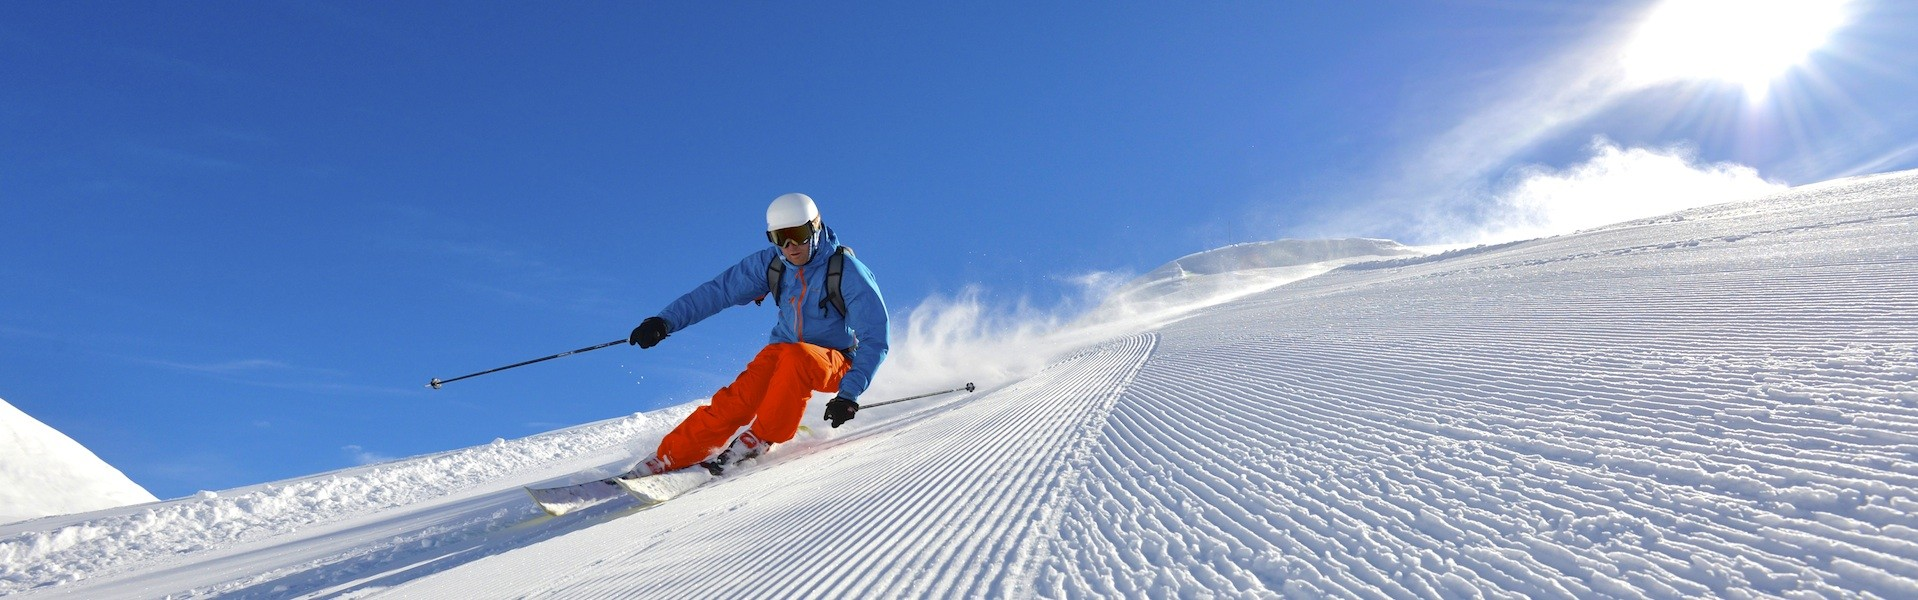 2-ski-david-machet-2096